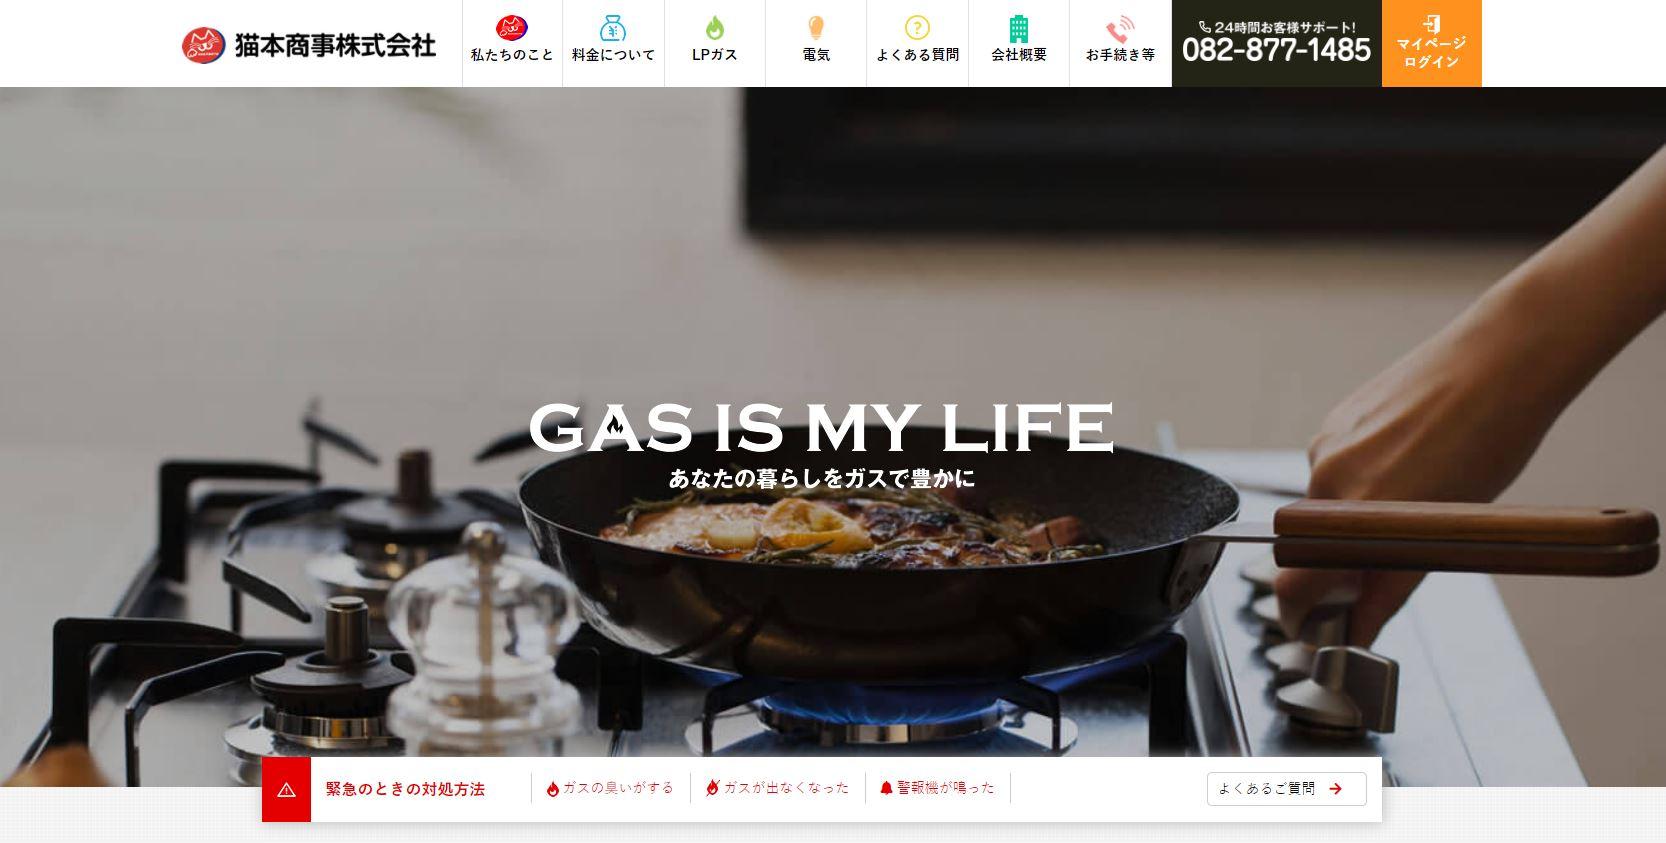 【WEB】お客様と一緒に作り続けるホームページ